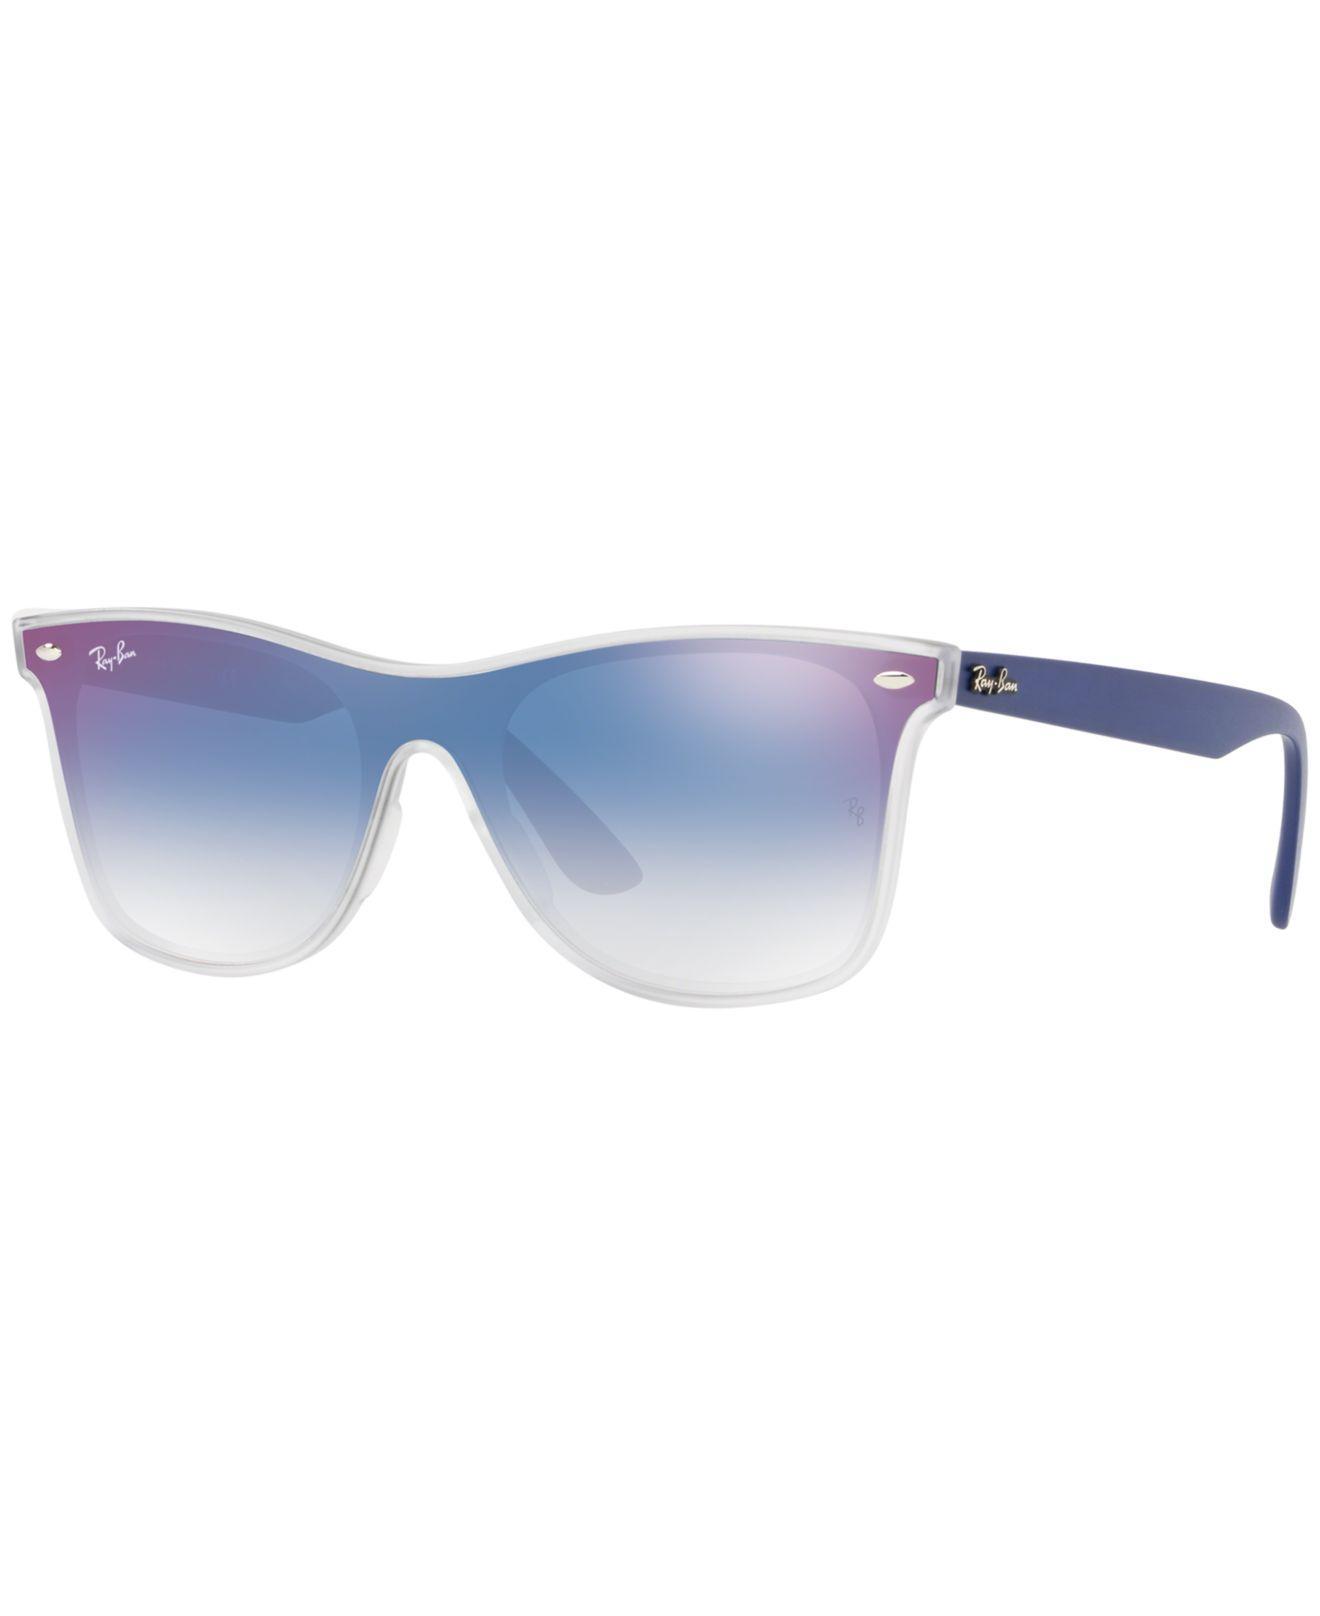 ec7bbe52c7 Ray-Ban. Women s Blue Sunglasses ...